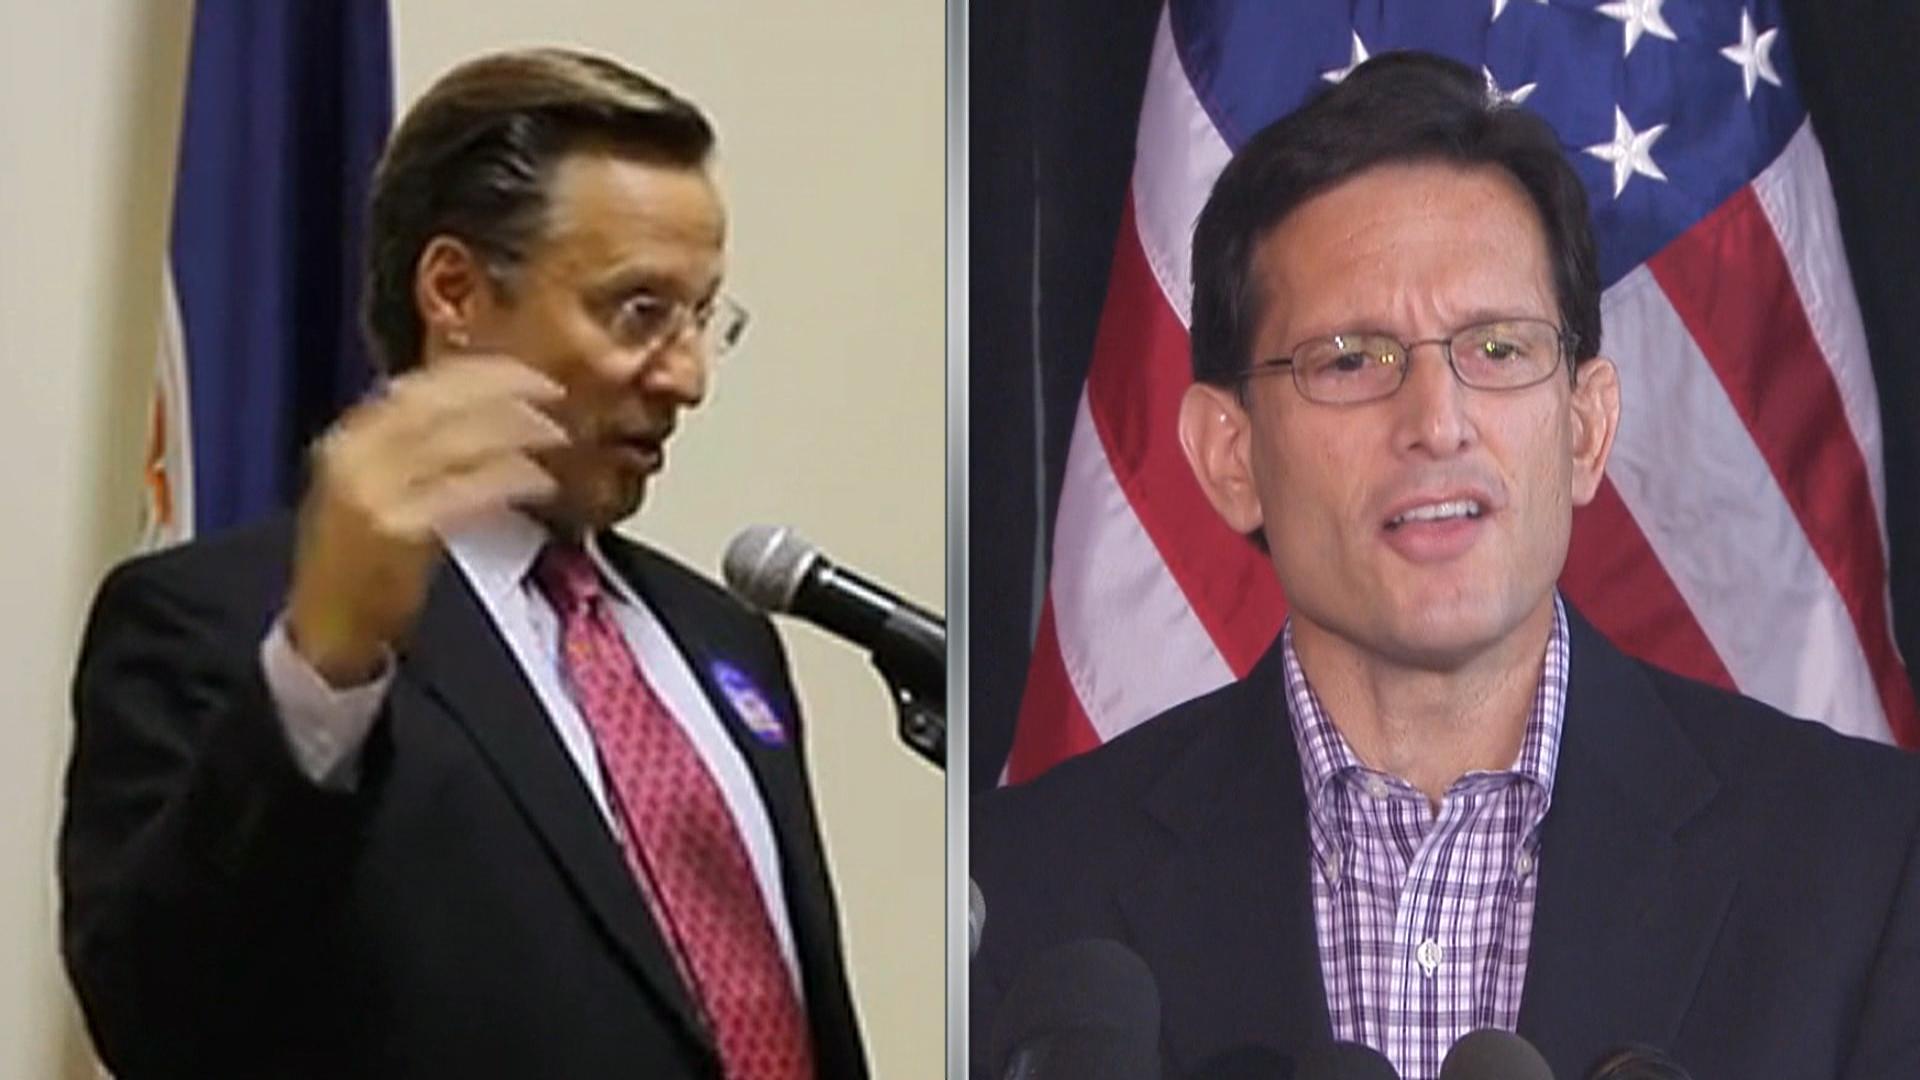 Cantor pressed, bails on immigration reform